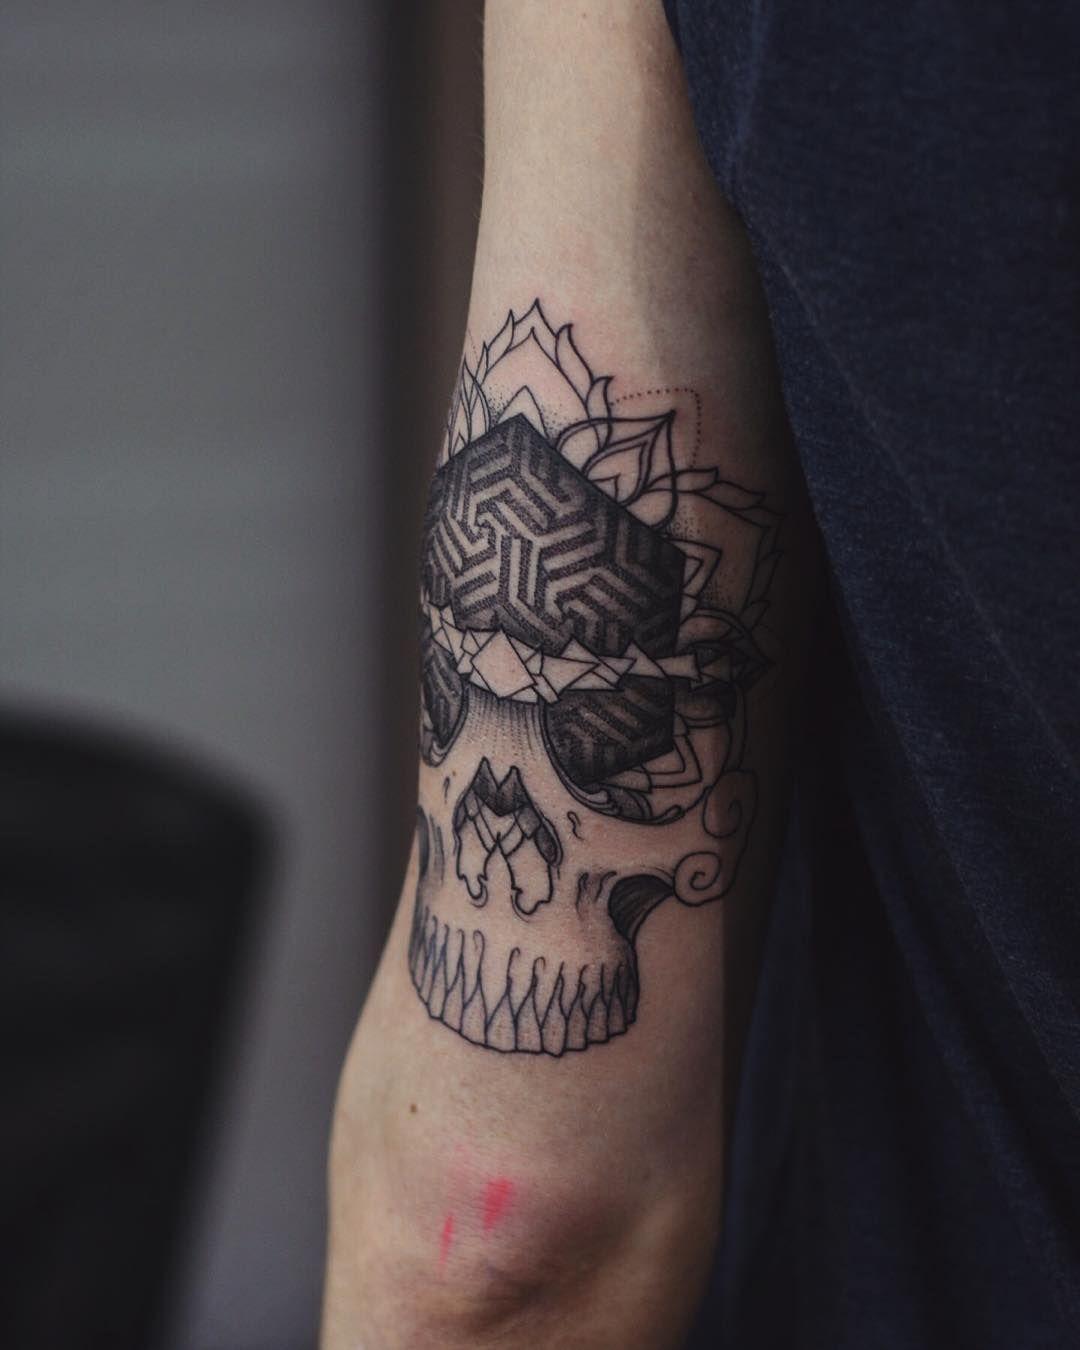 Evgenykopanov tattoo evgenykopanov linework ink taot